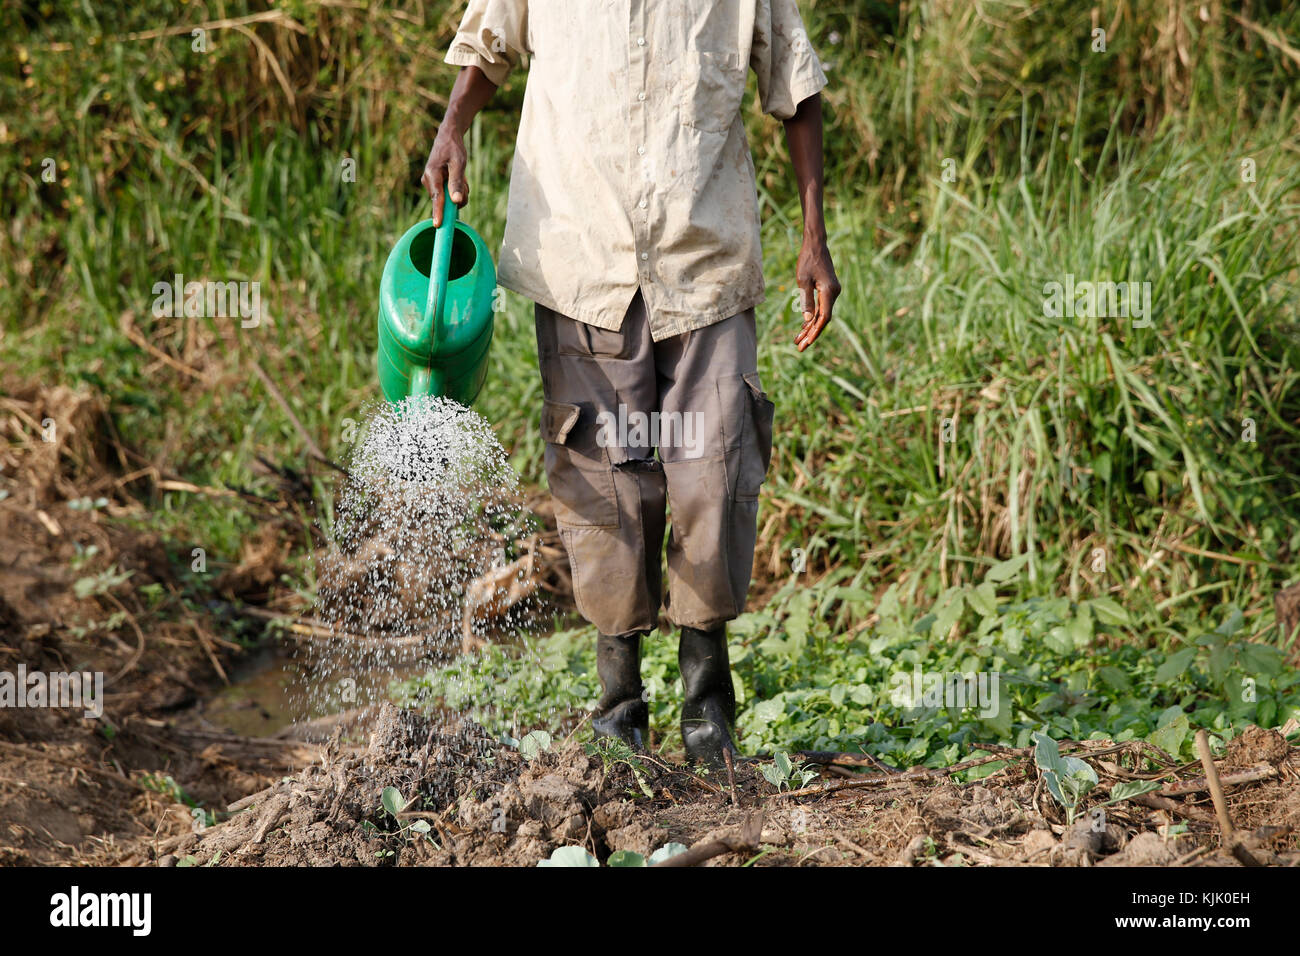 Farmer Apollo Byarunga received 2 loans from ENCOT microfinance. Uganda - Stock Image